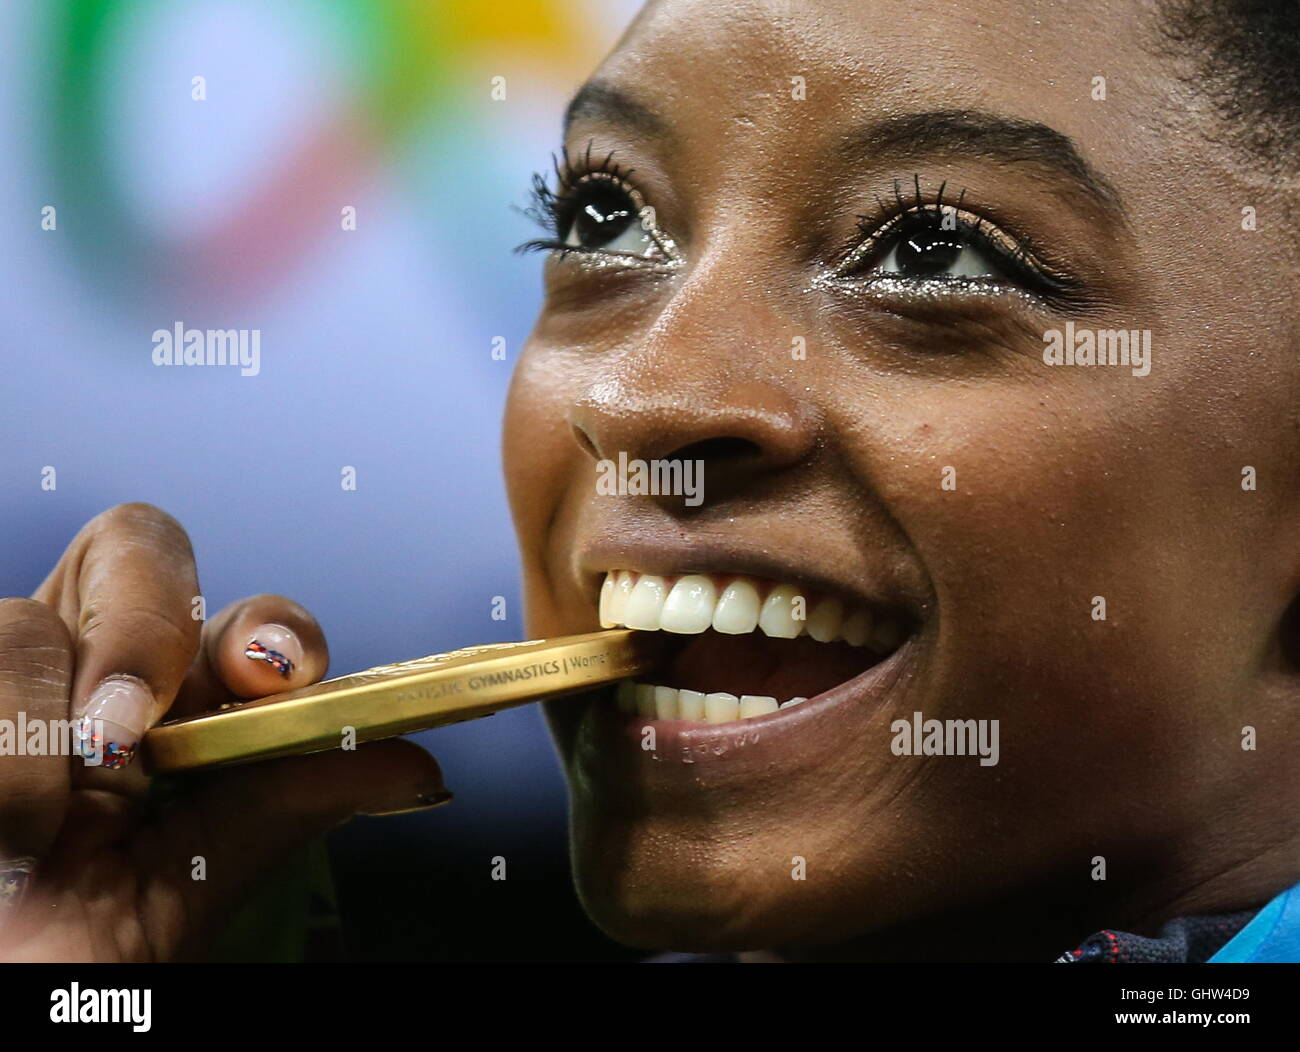 Rio De Janeiro, Brasilien. 11. August 2016. Goldmedaillengewinner Simone Biles der USA bei einer Preisverleihung Stockbild